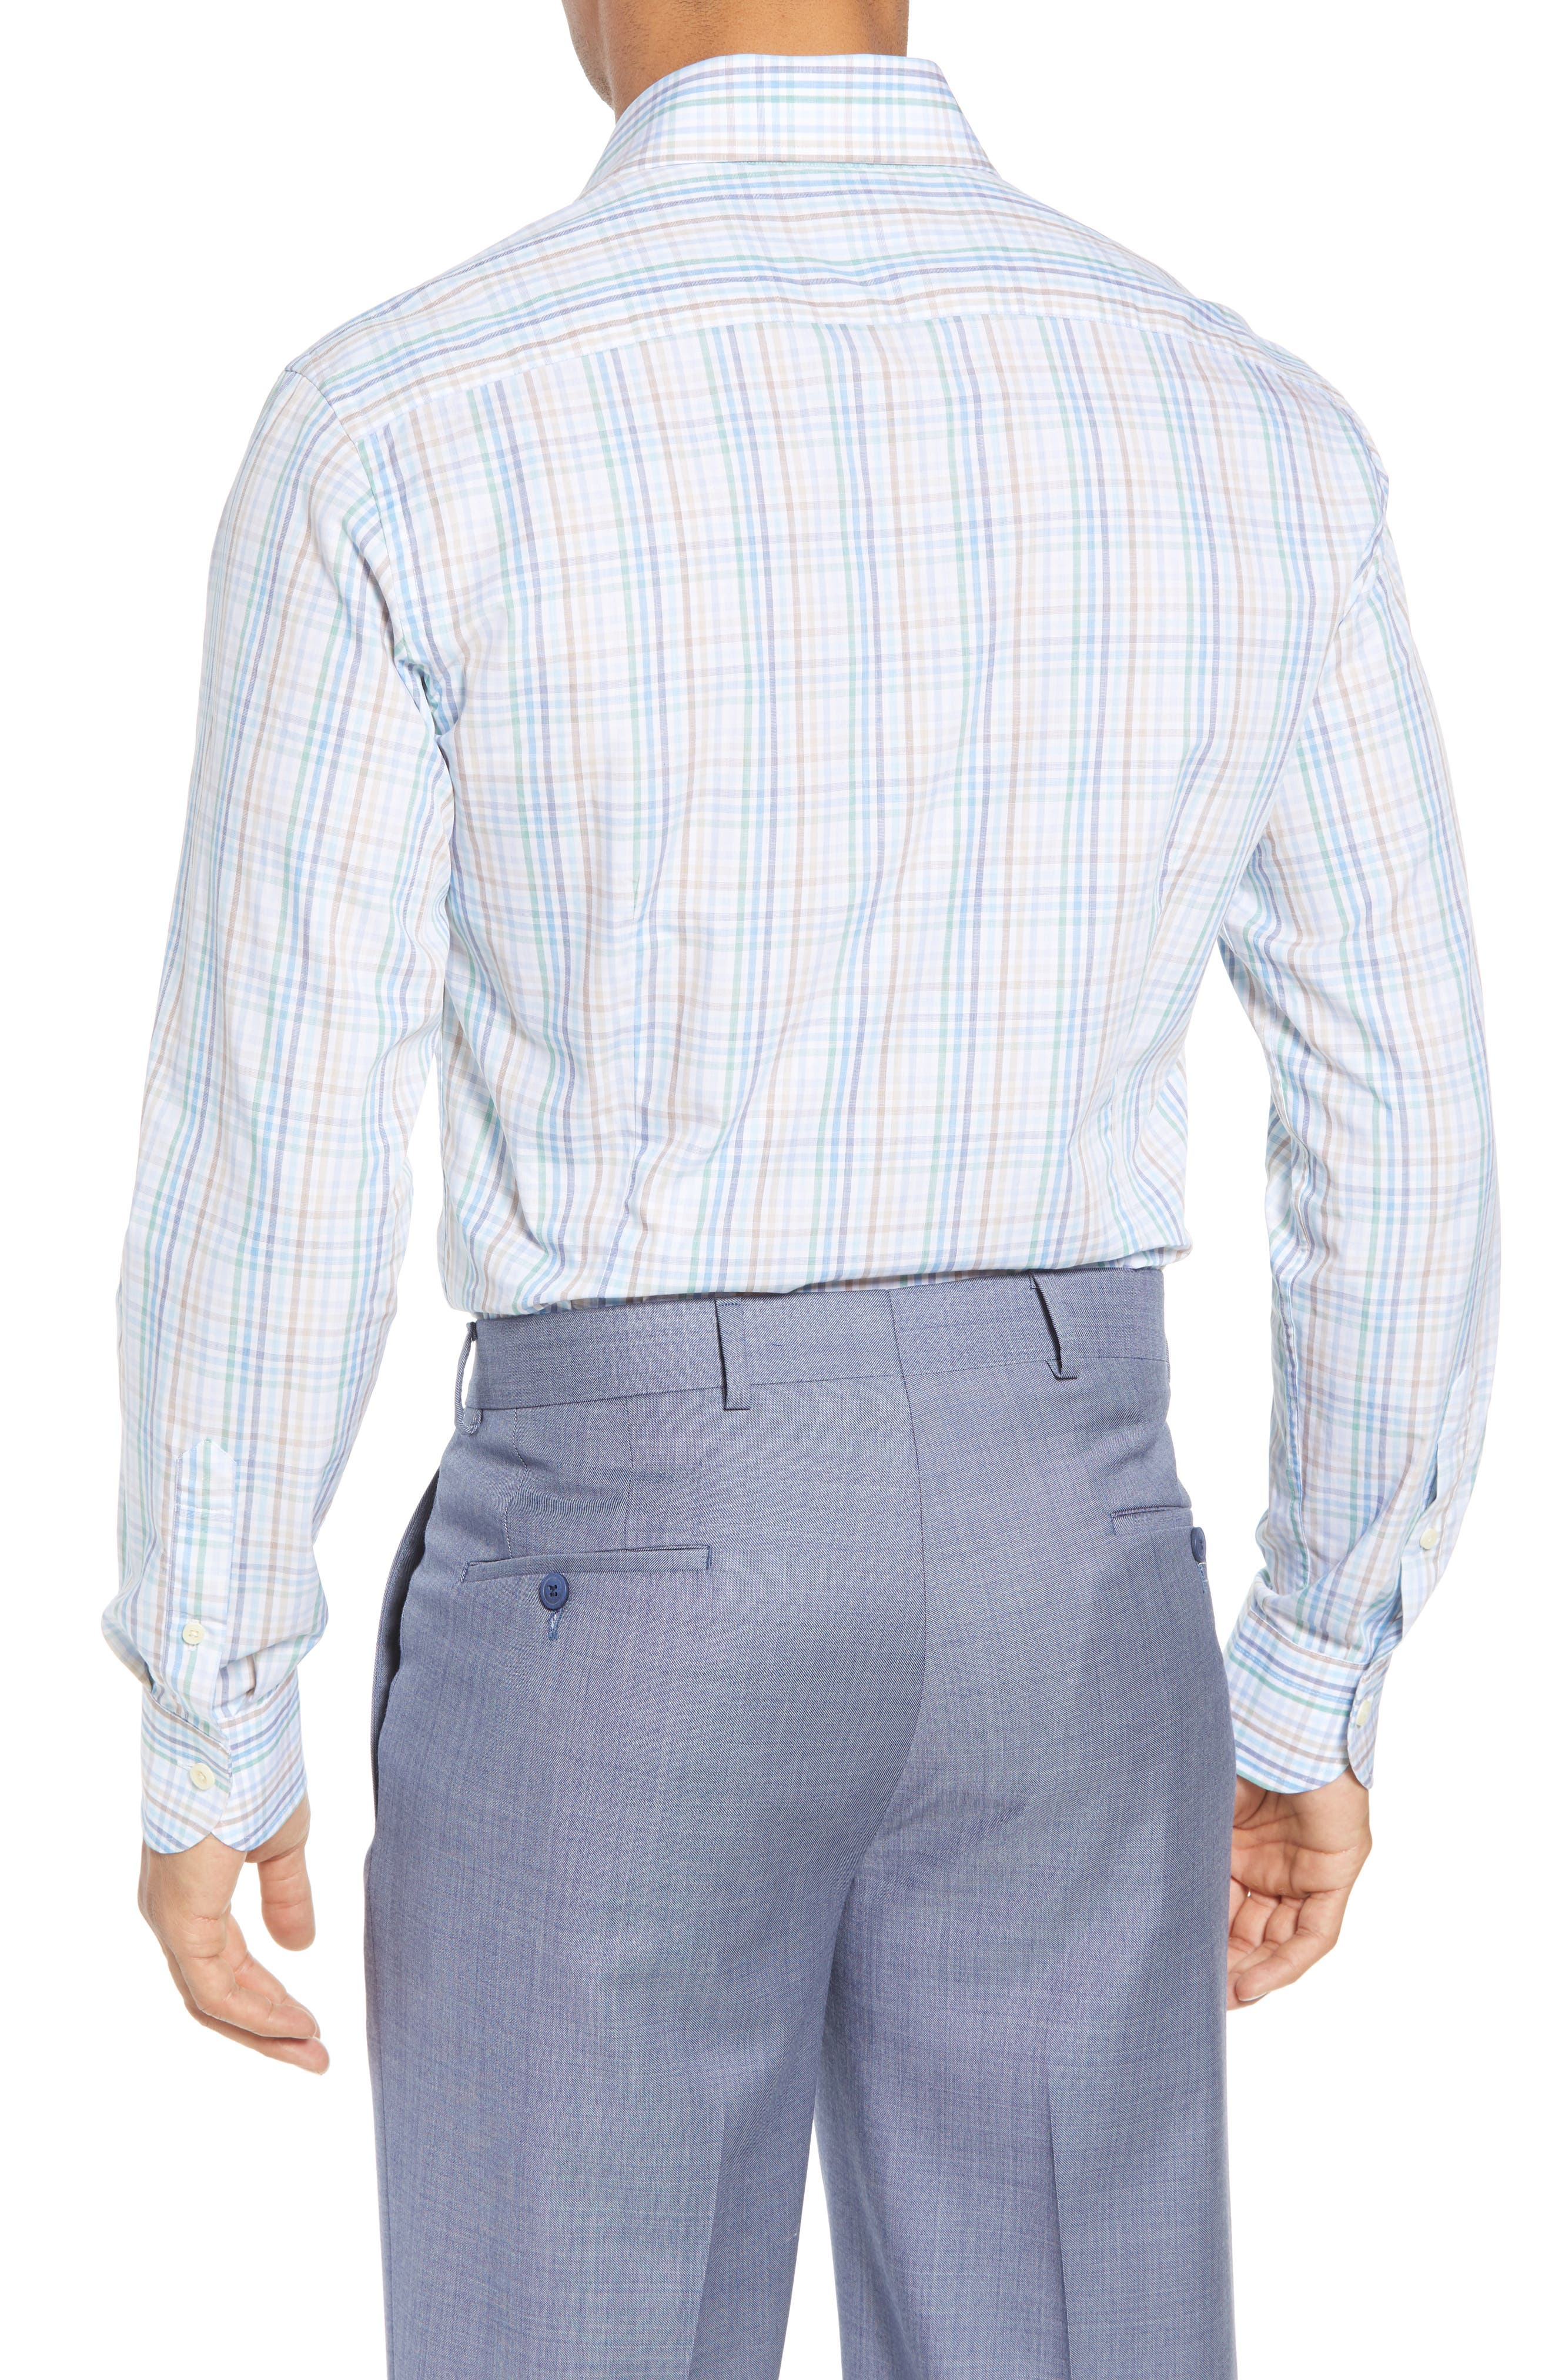 Albright Slim Fit Check Dress Shirt,                             Alternate thumbnail 3, color,                             Hunter